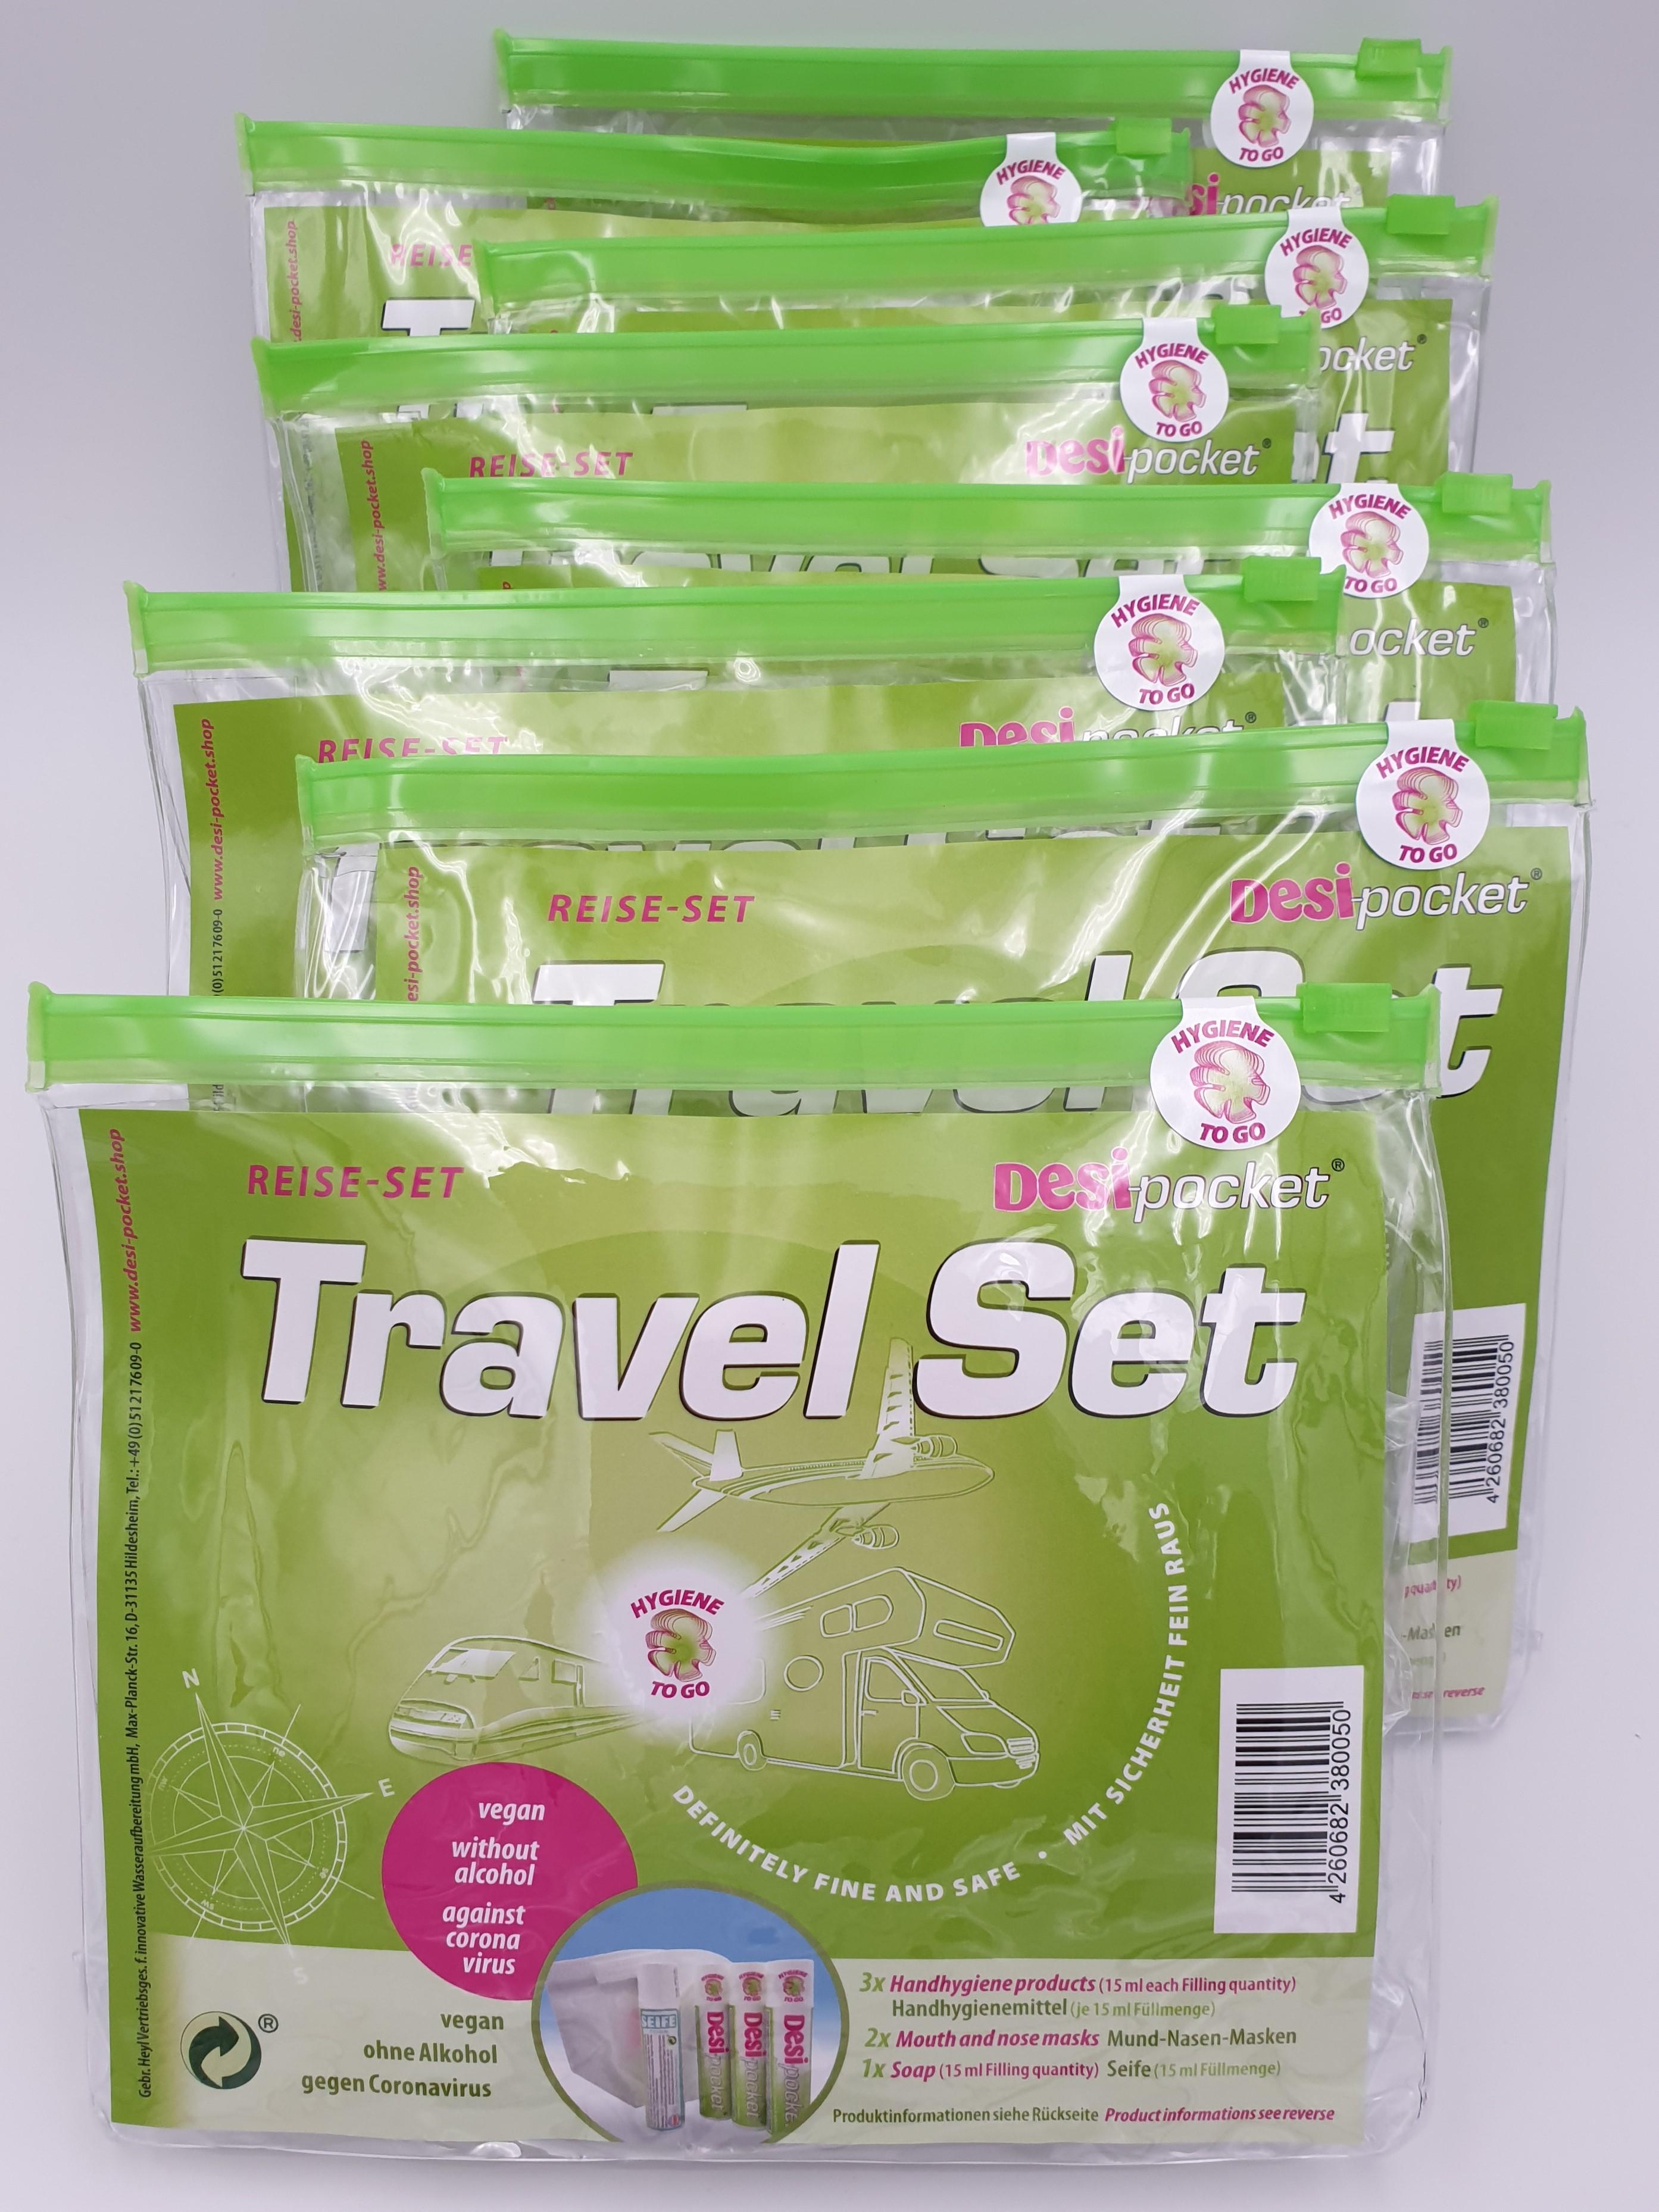 Desi-pocket Travel Set Kennenlern- Angebot - vegan - ohne Alkohol - gegen Coronavirus